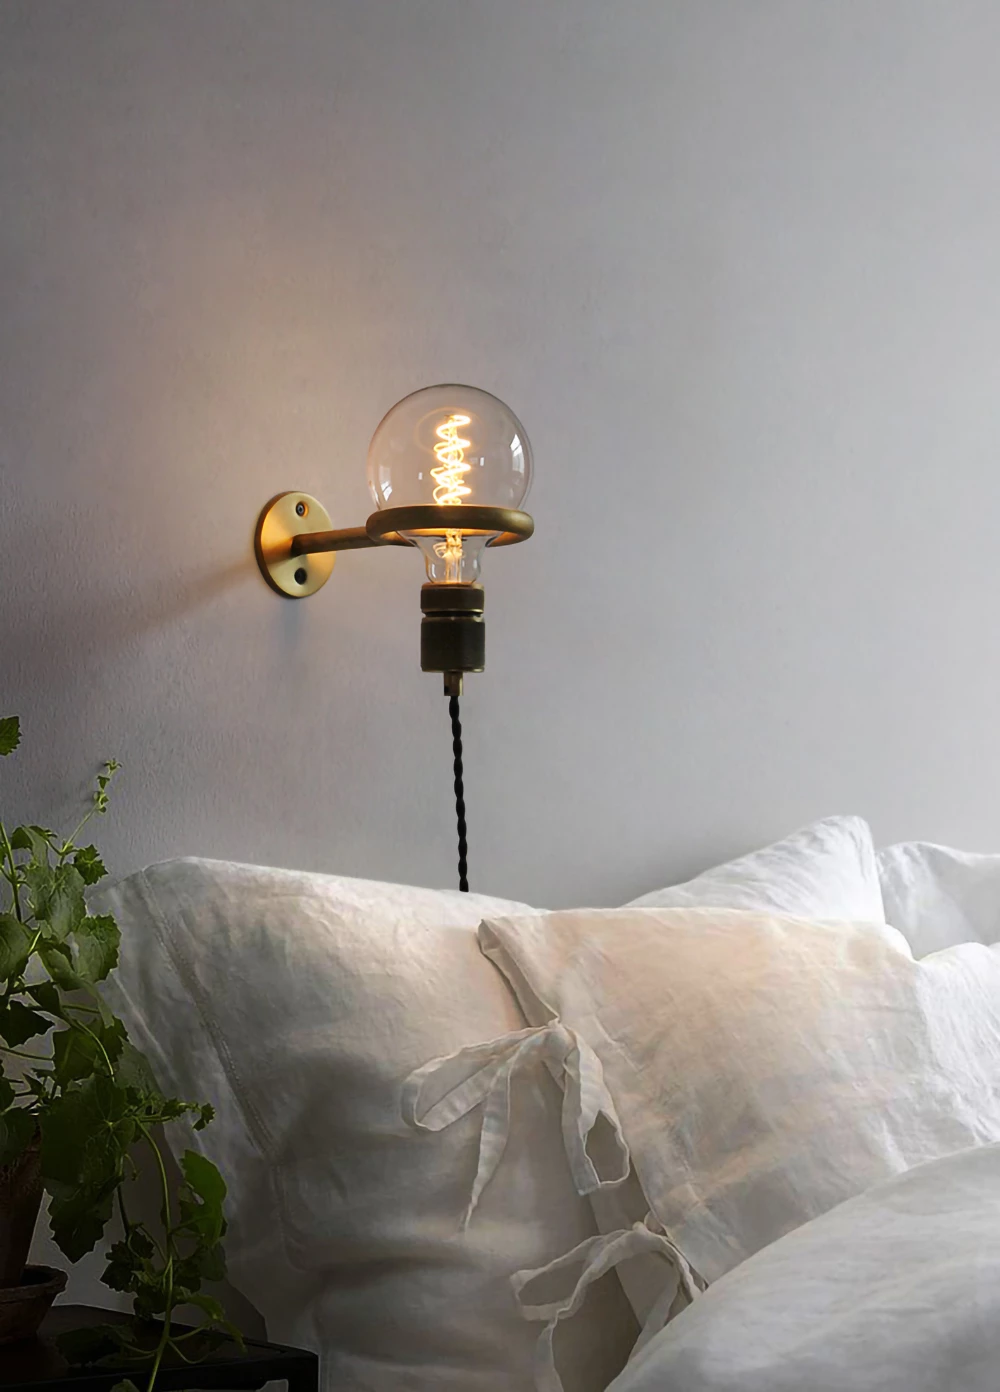 Loop Minimalist Wall Light With Wall Socket Bedside Wall Lights Wall Lights Wall Lights Bedroom